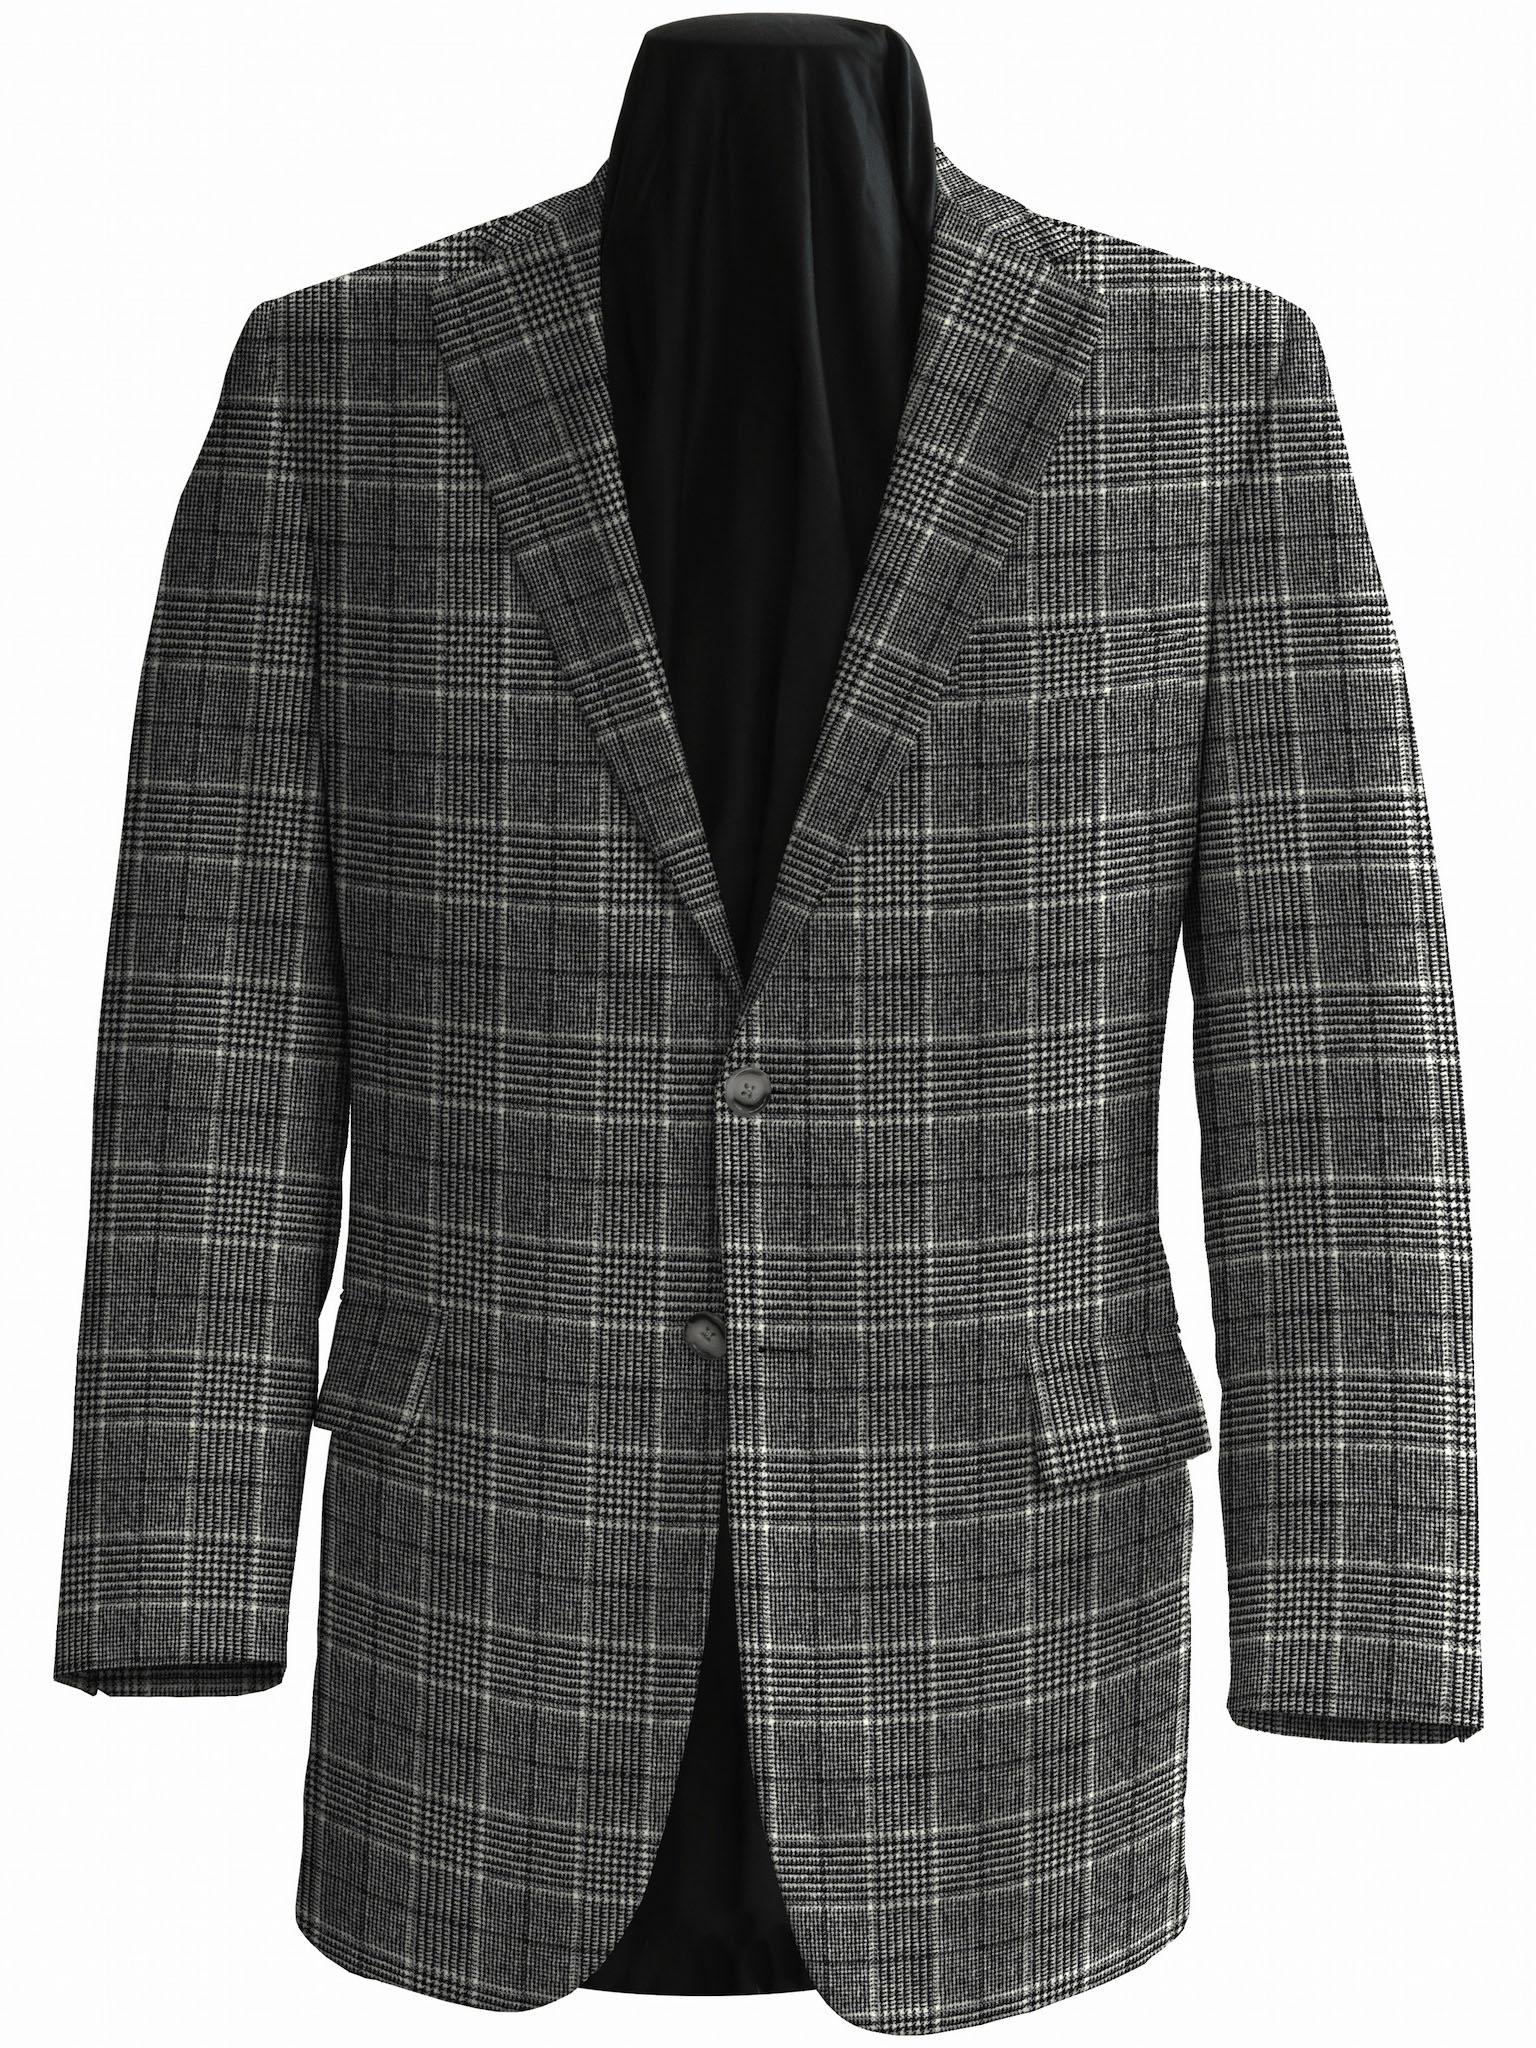 Sherry Kash Jackets Ltd Edition 904022